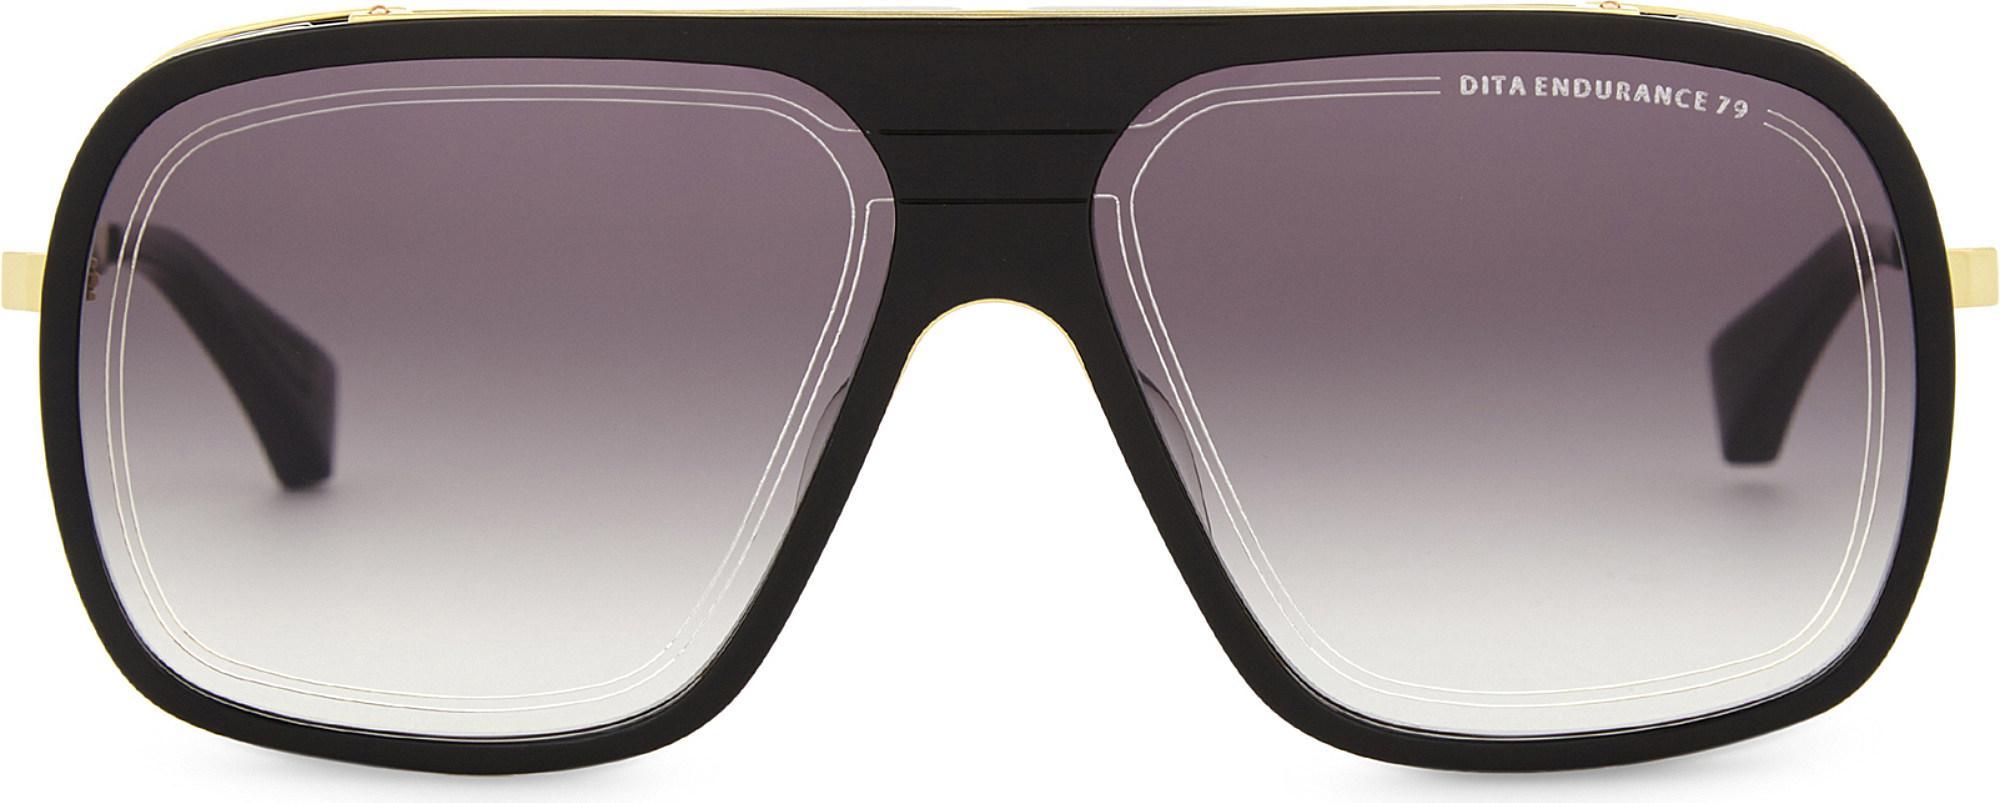 b91ab65ad19f Lyst - DITA Endurance 79 Square-frame Sunglasses in Blue